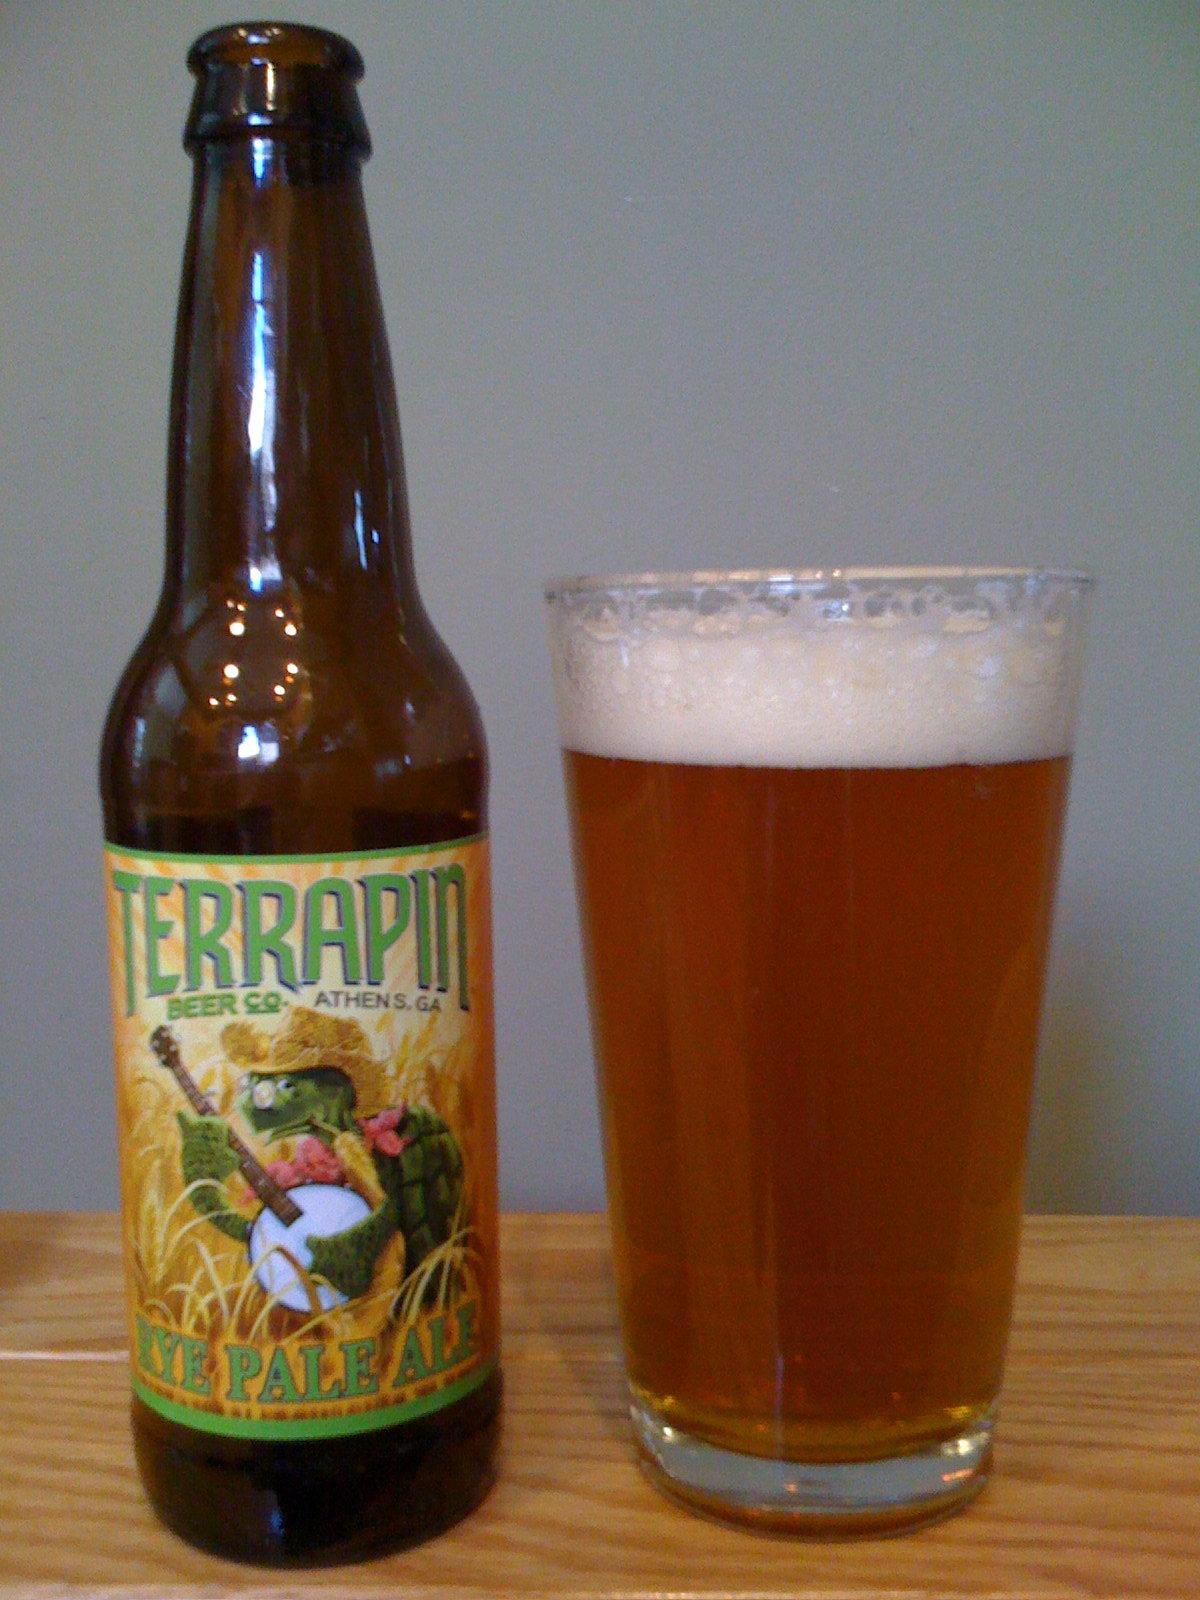 Terrapin Rye Pale Ale